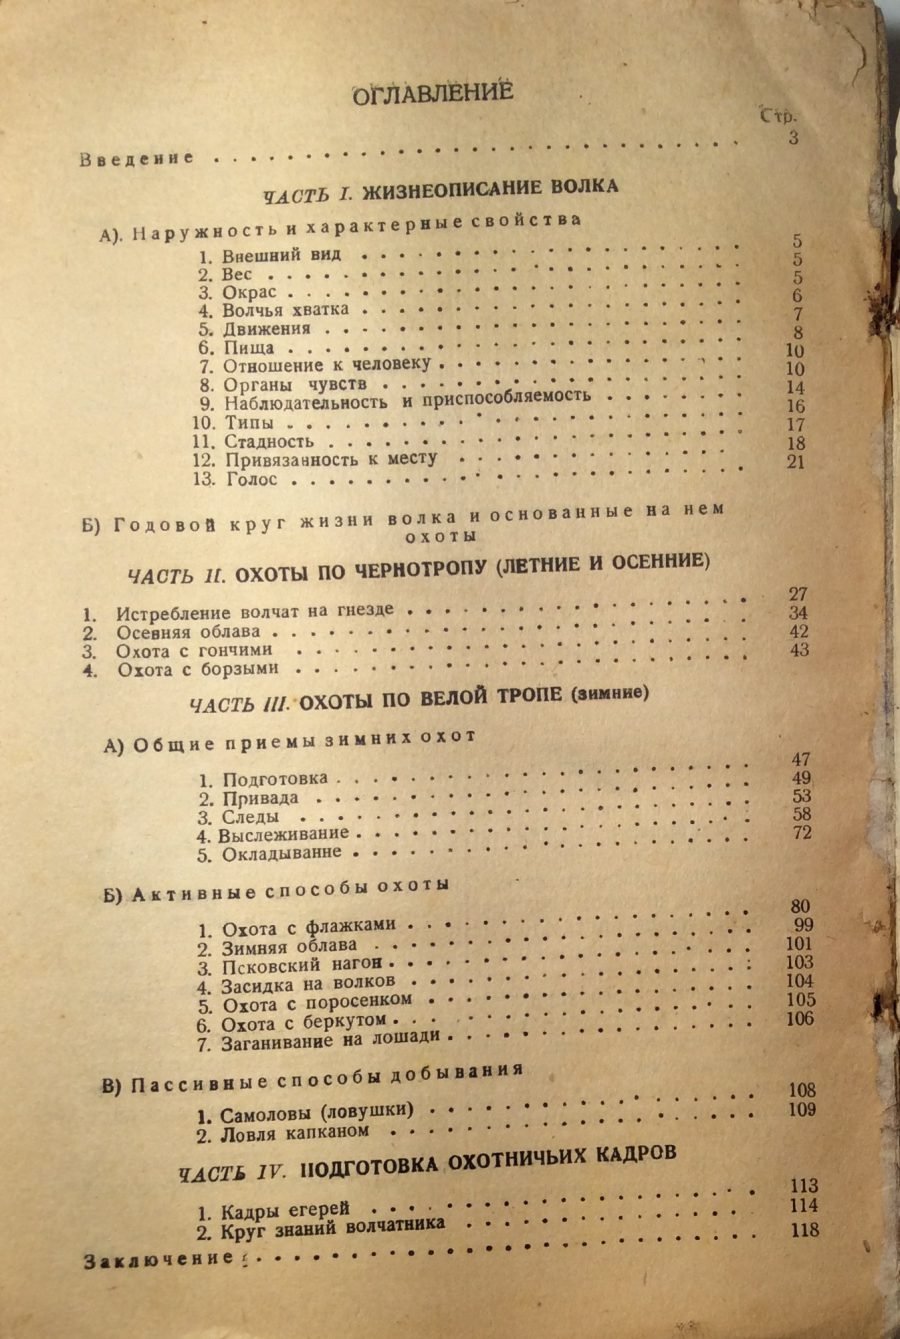 Зворыкин Н.А. Волк и борьба с ним.